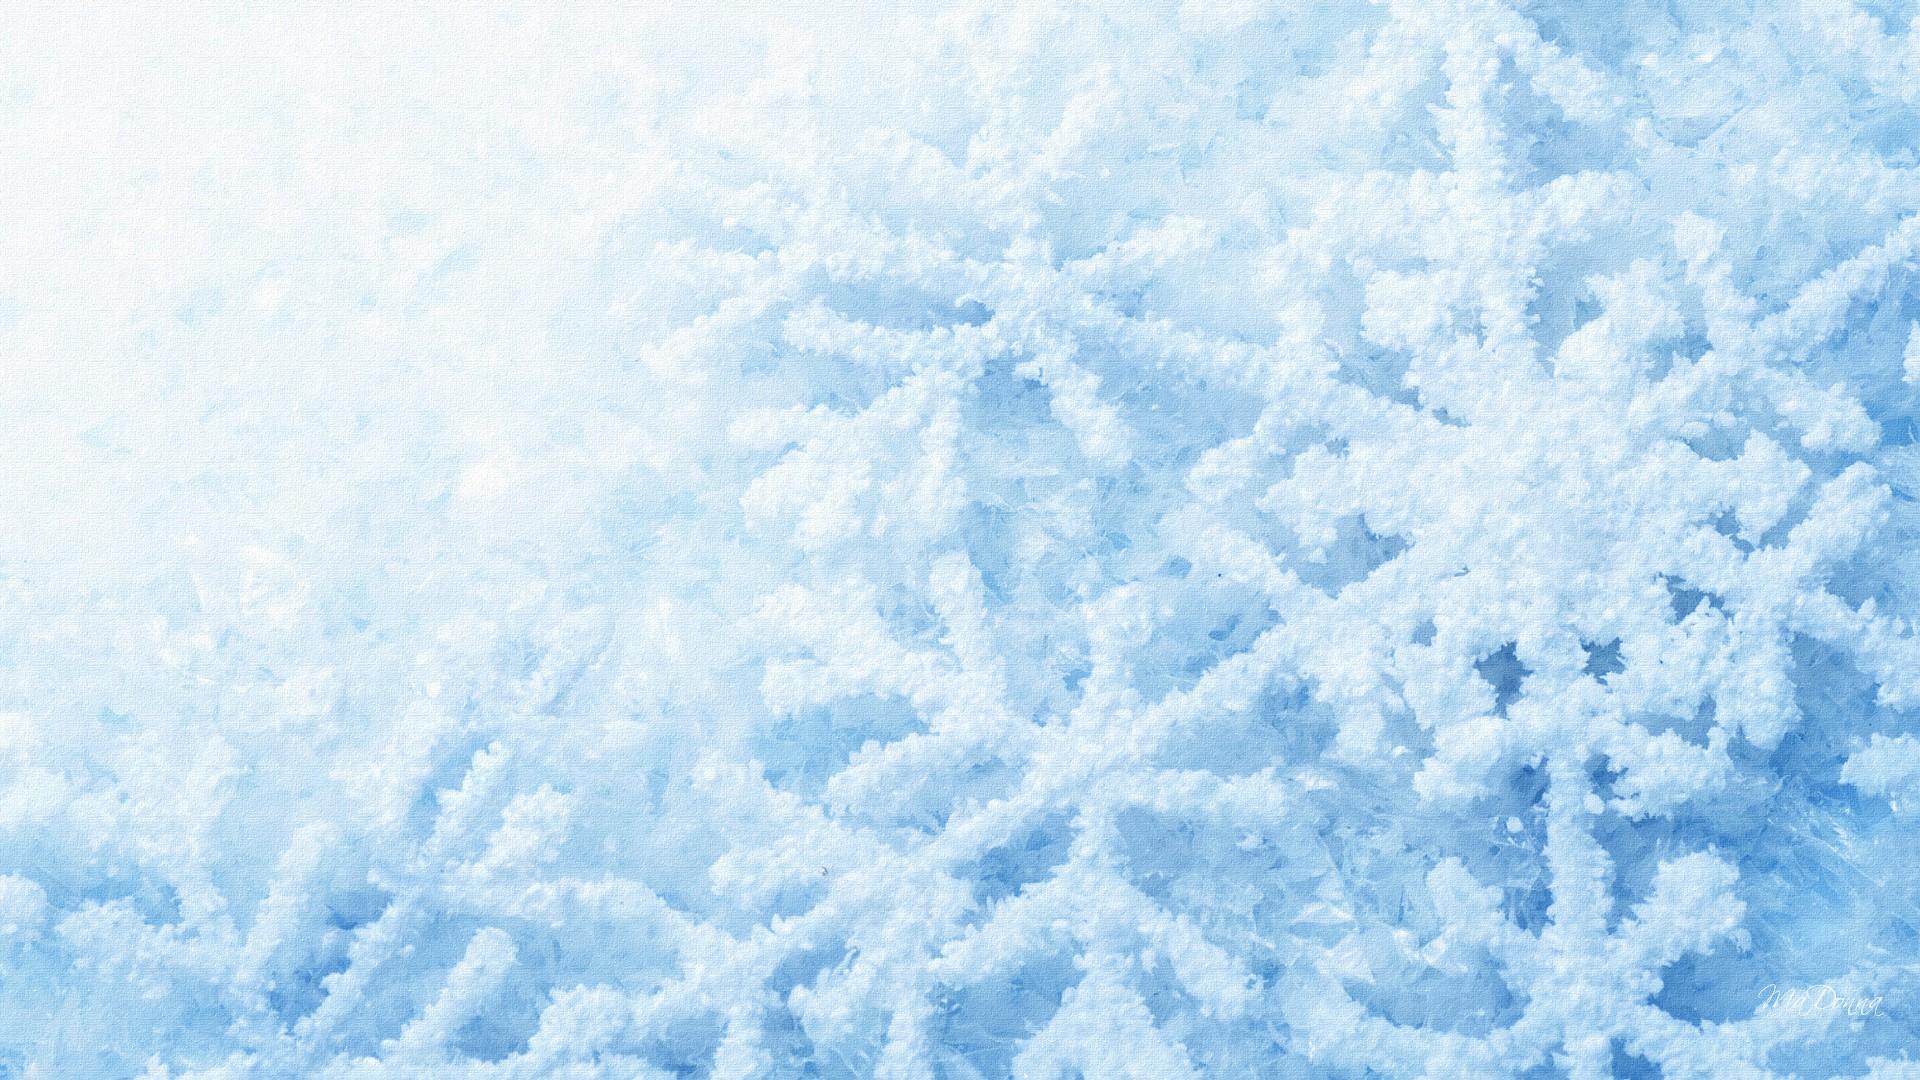 Snowflake Wallpaper HD PixelsTalk Snowflakes Computer Wallpapers, Desktop Backgrounds 1920x1080